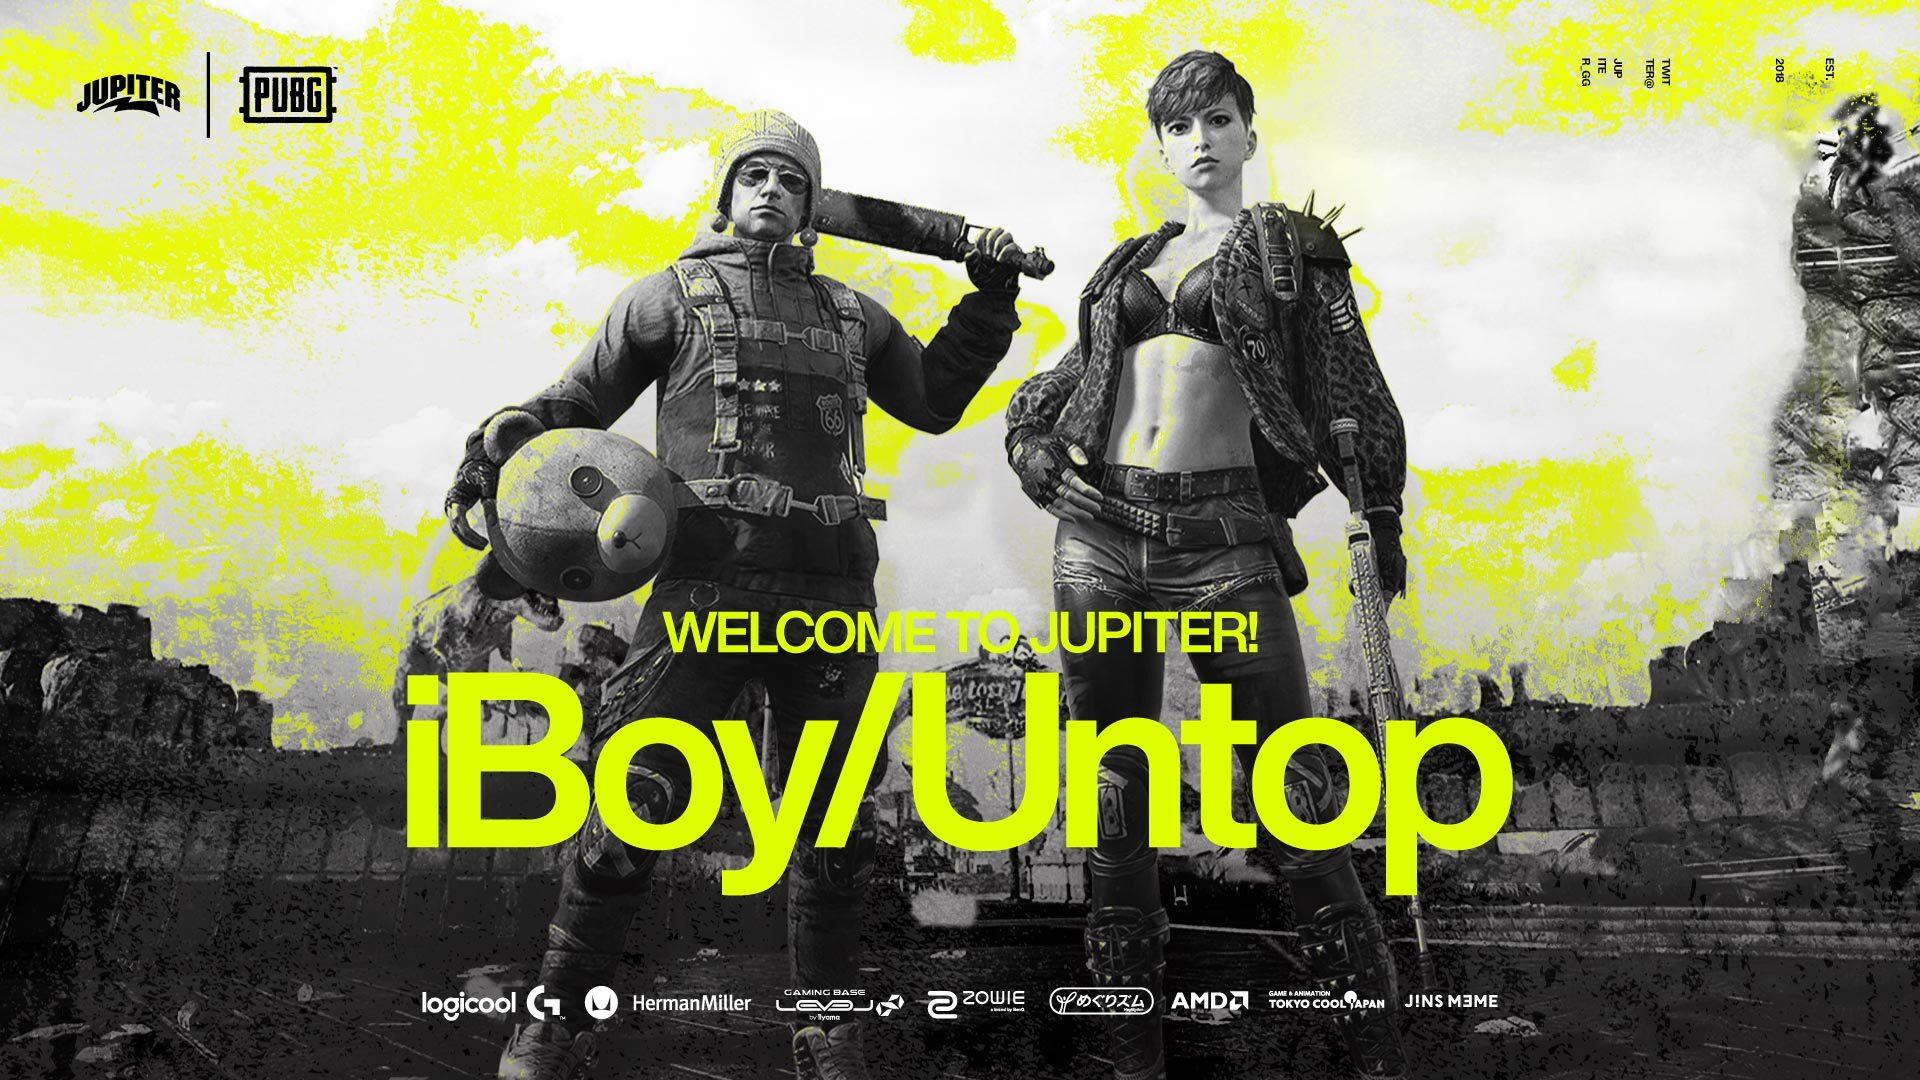 PUBG – iBoy,Untop,Middleee 加入